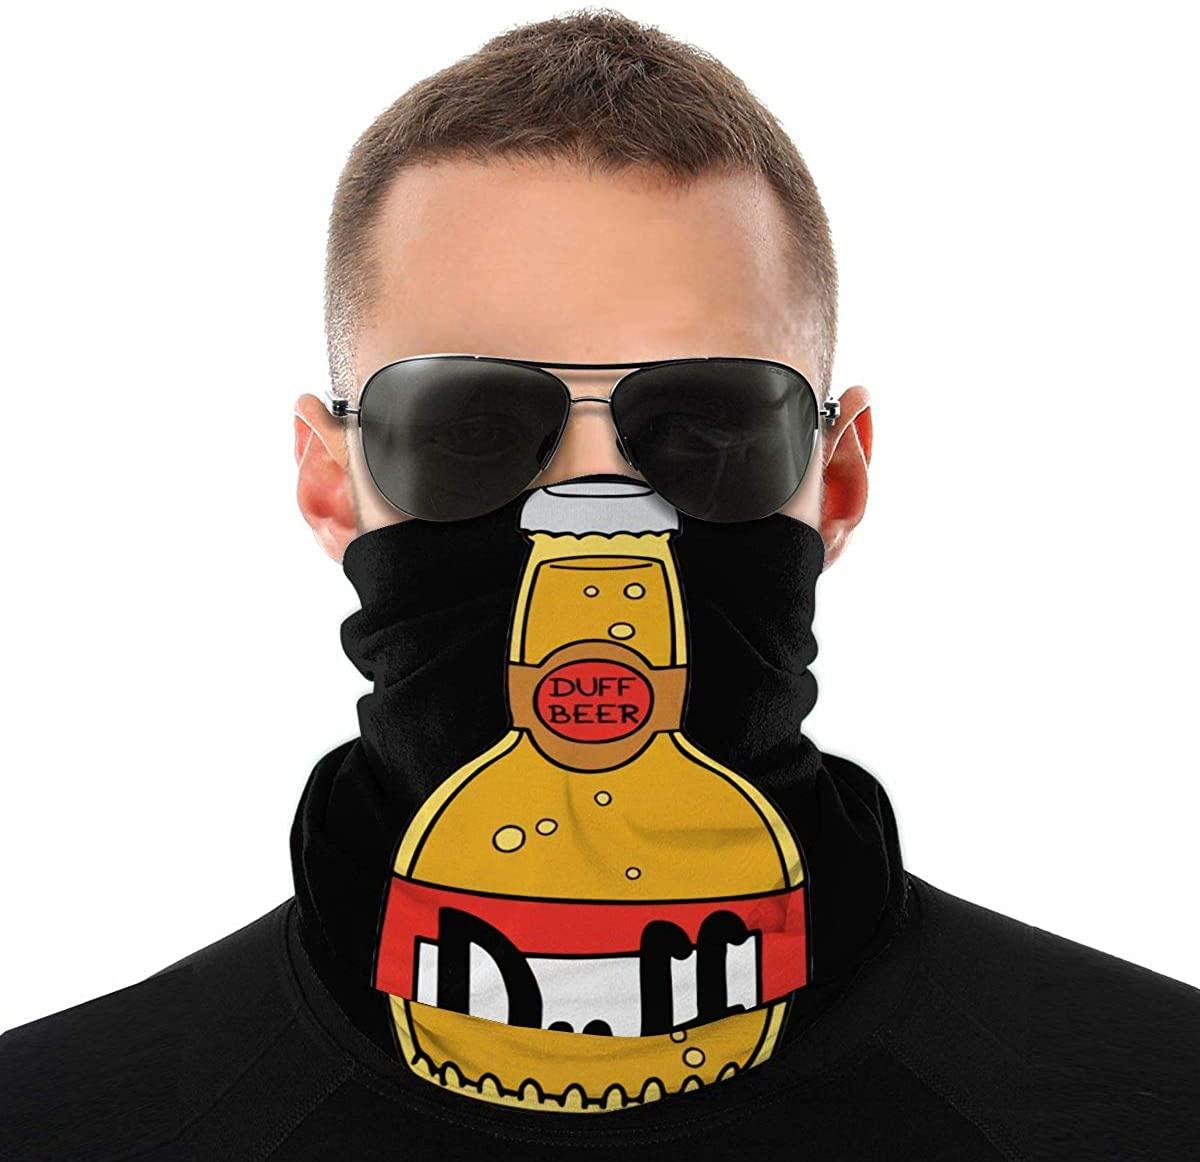 Simpsons Duff Beer Face Mask Bandana Neck Gaiter Tube Headwear Bandana, Seamless Rave Face Mask Scarf